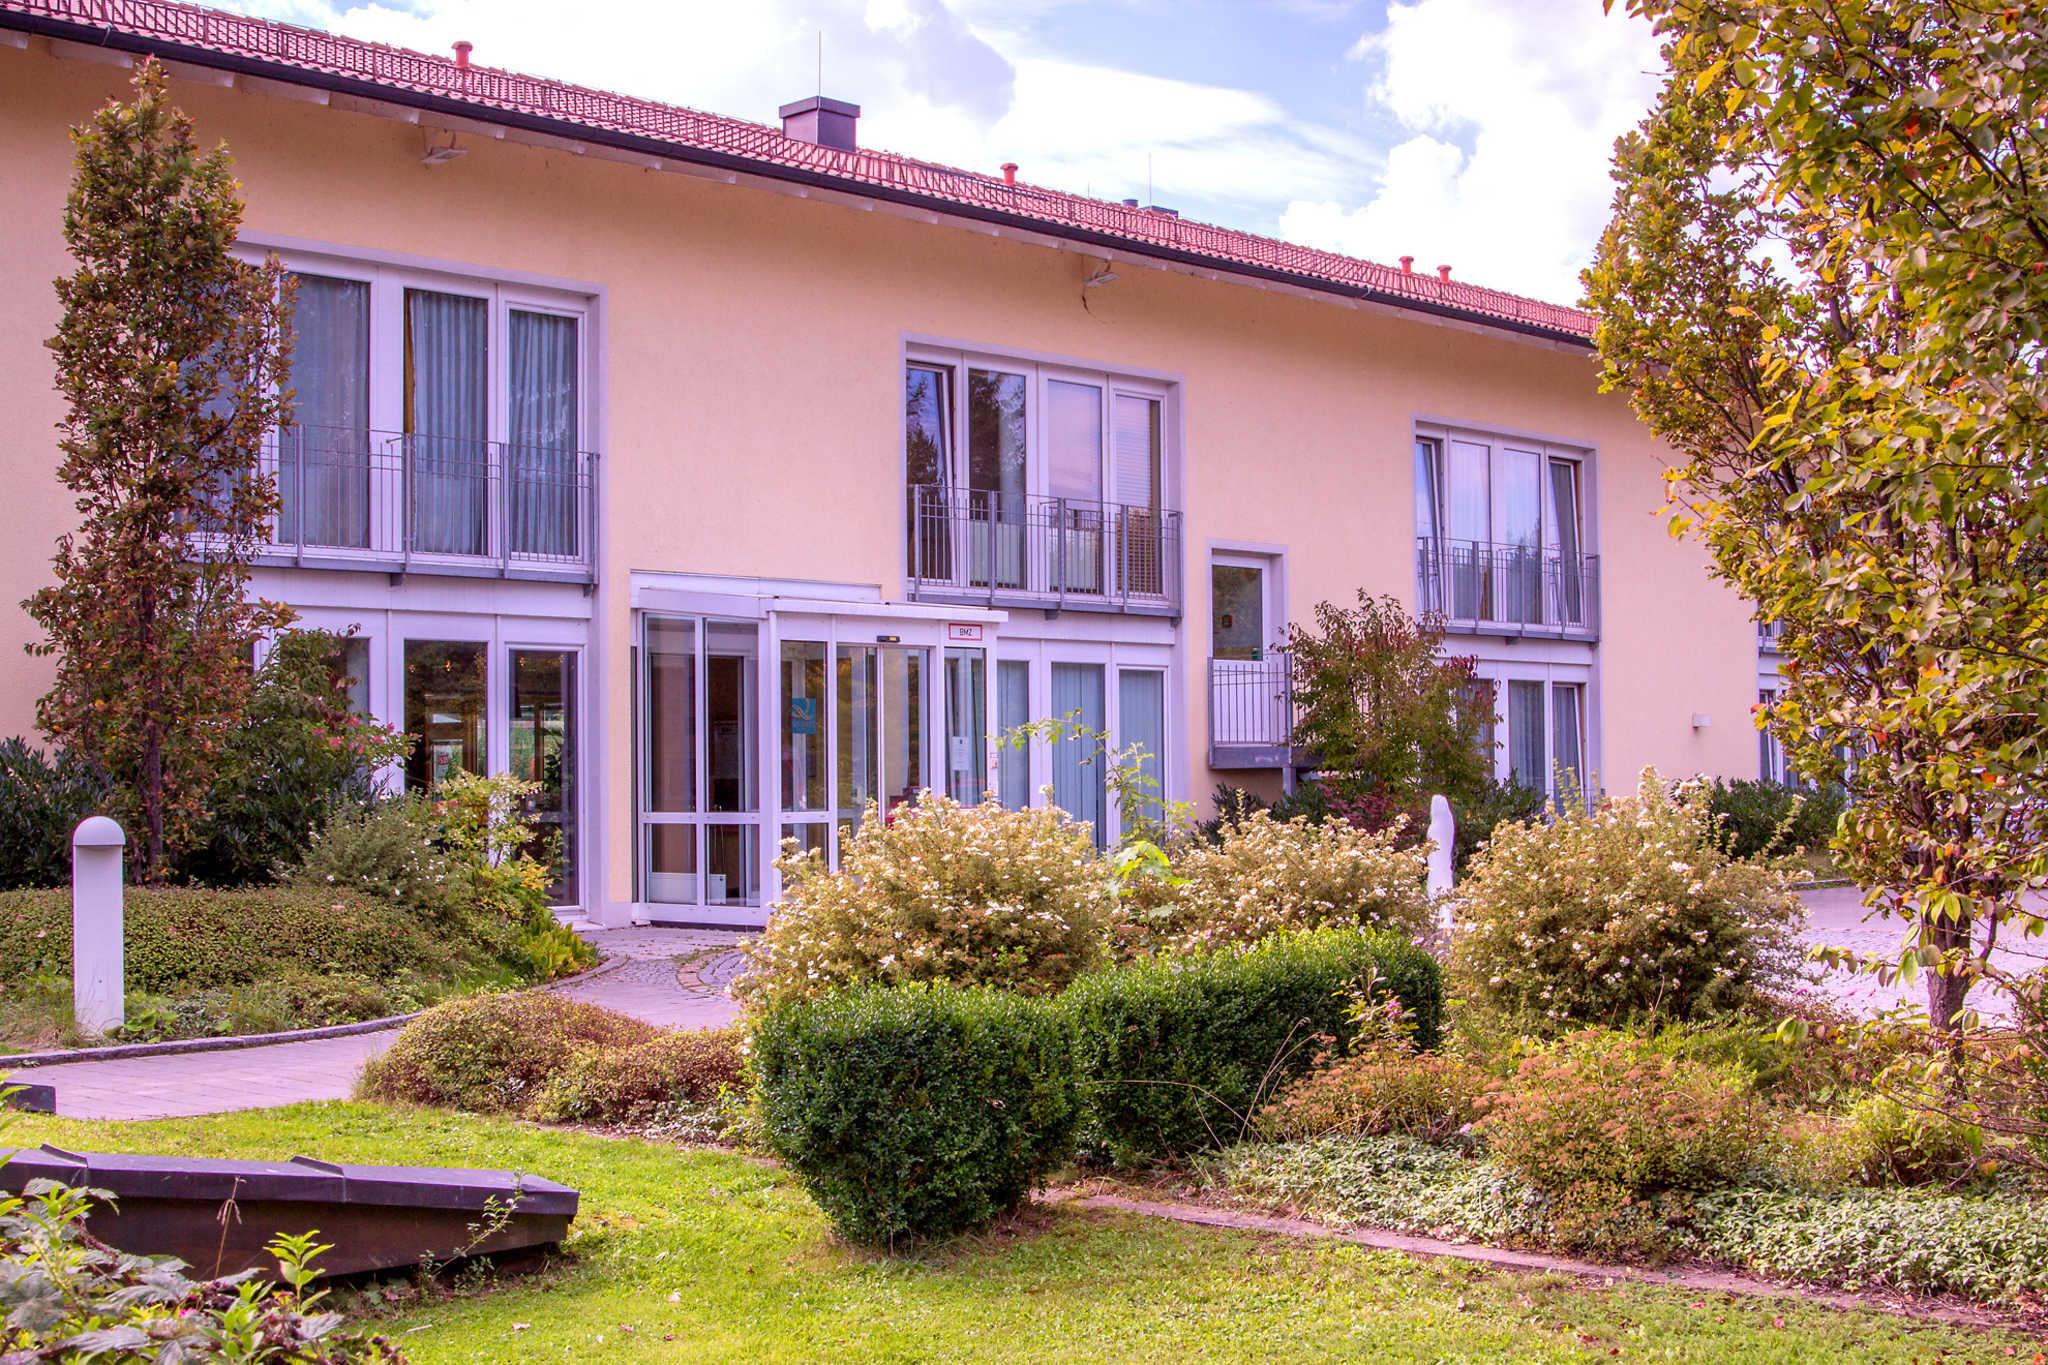 Quality Hotel & Suites Muenchen Messe, Johann-Karg-Strasse 3 in Haar